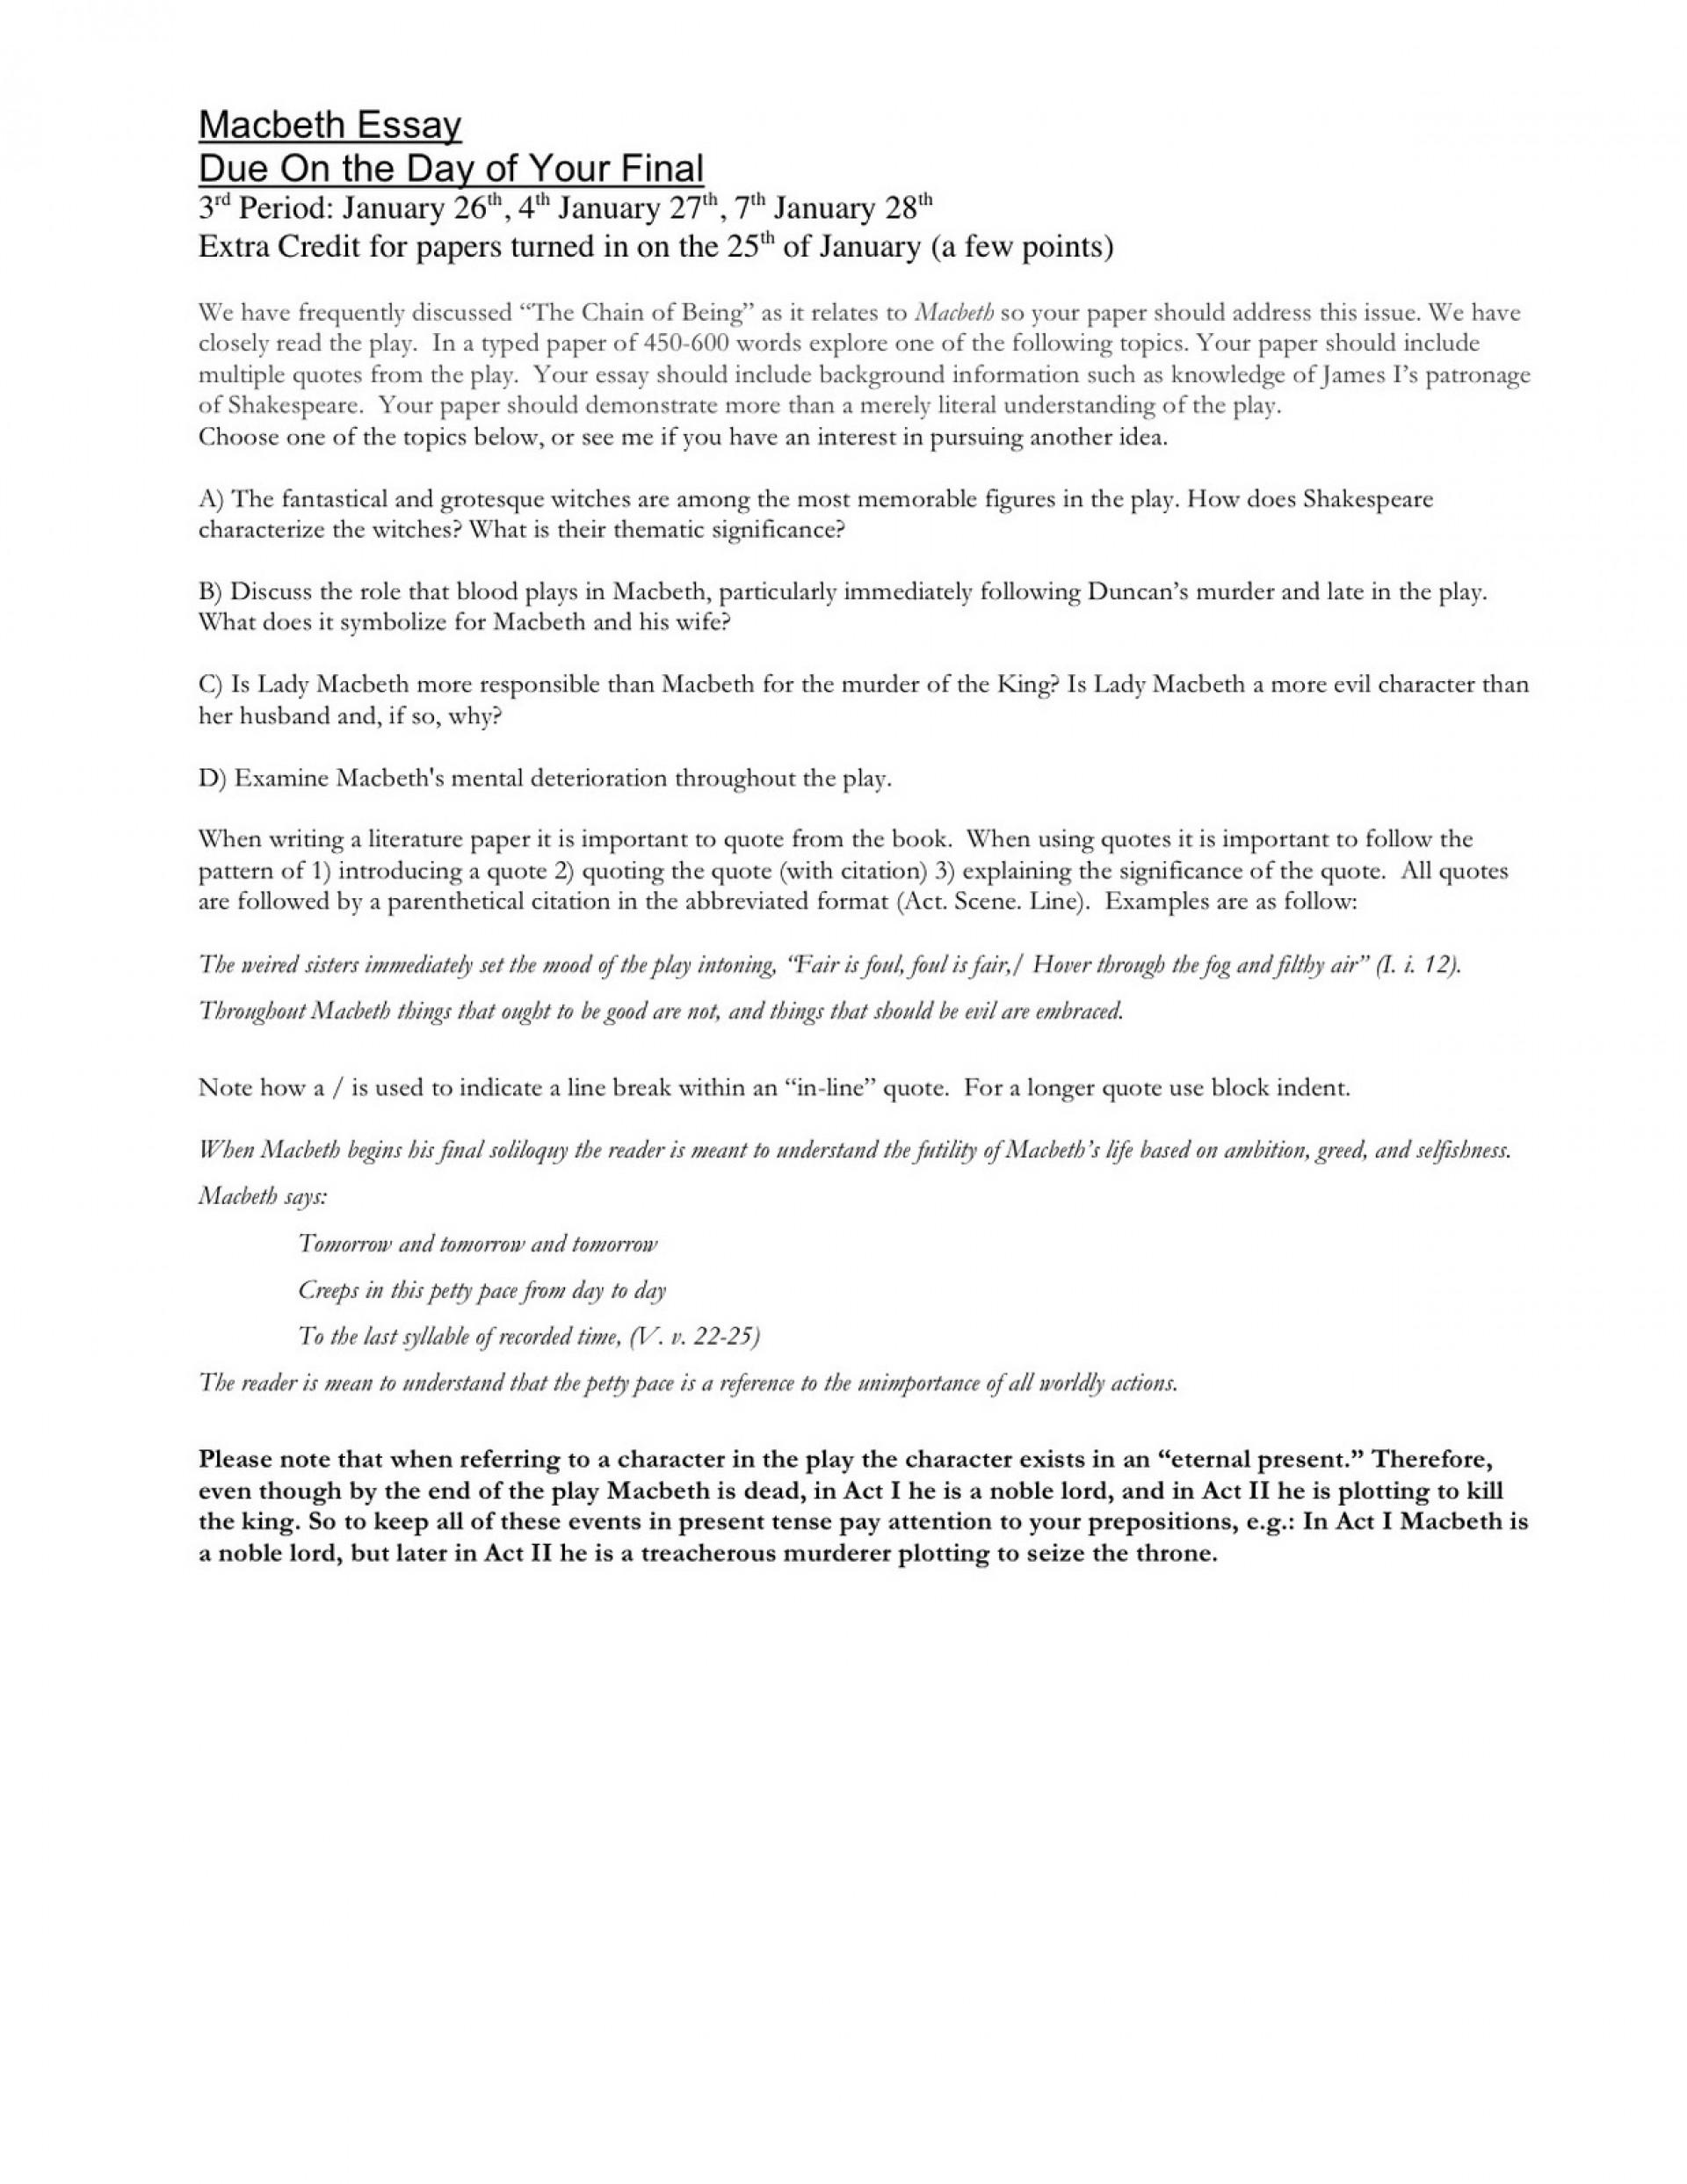 Relationship deterioration essay